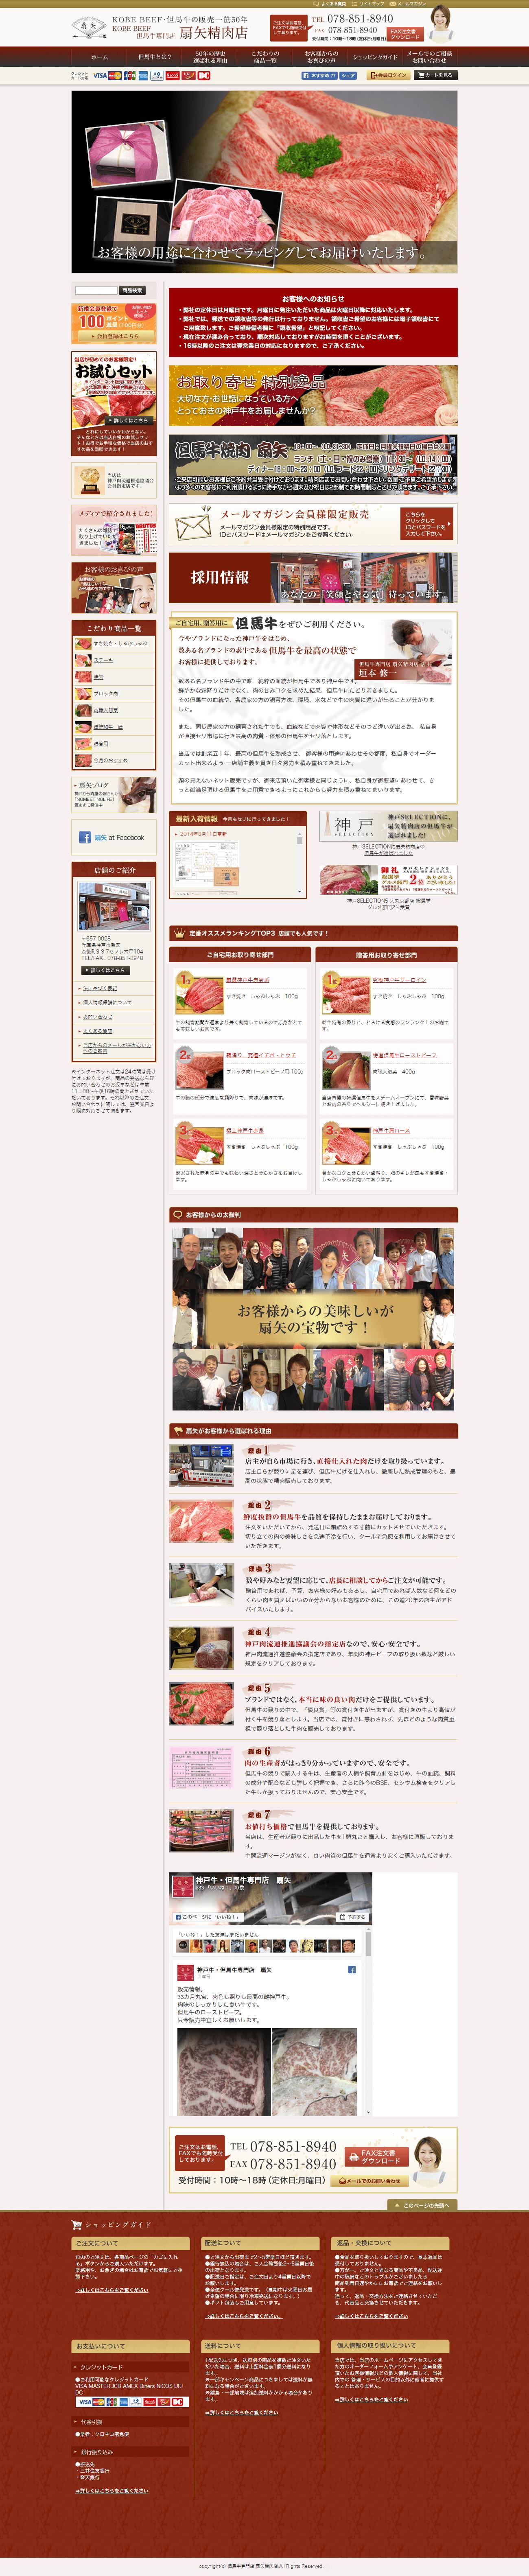 神戸市 株式会社 扇矢(扇矢精肉店)様 ホームページ制作1